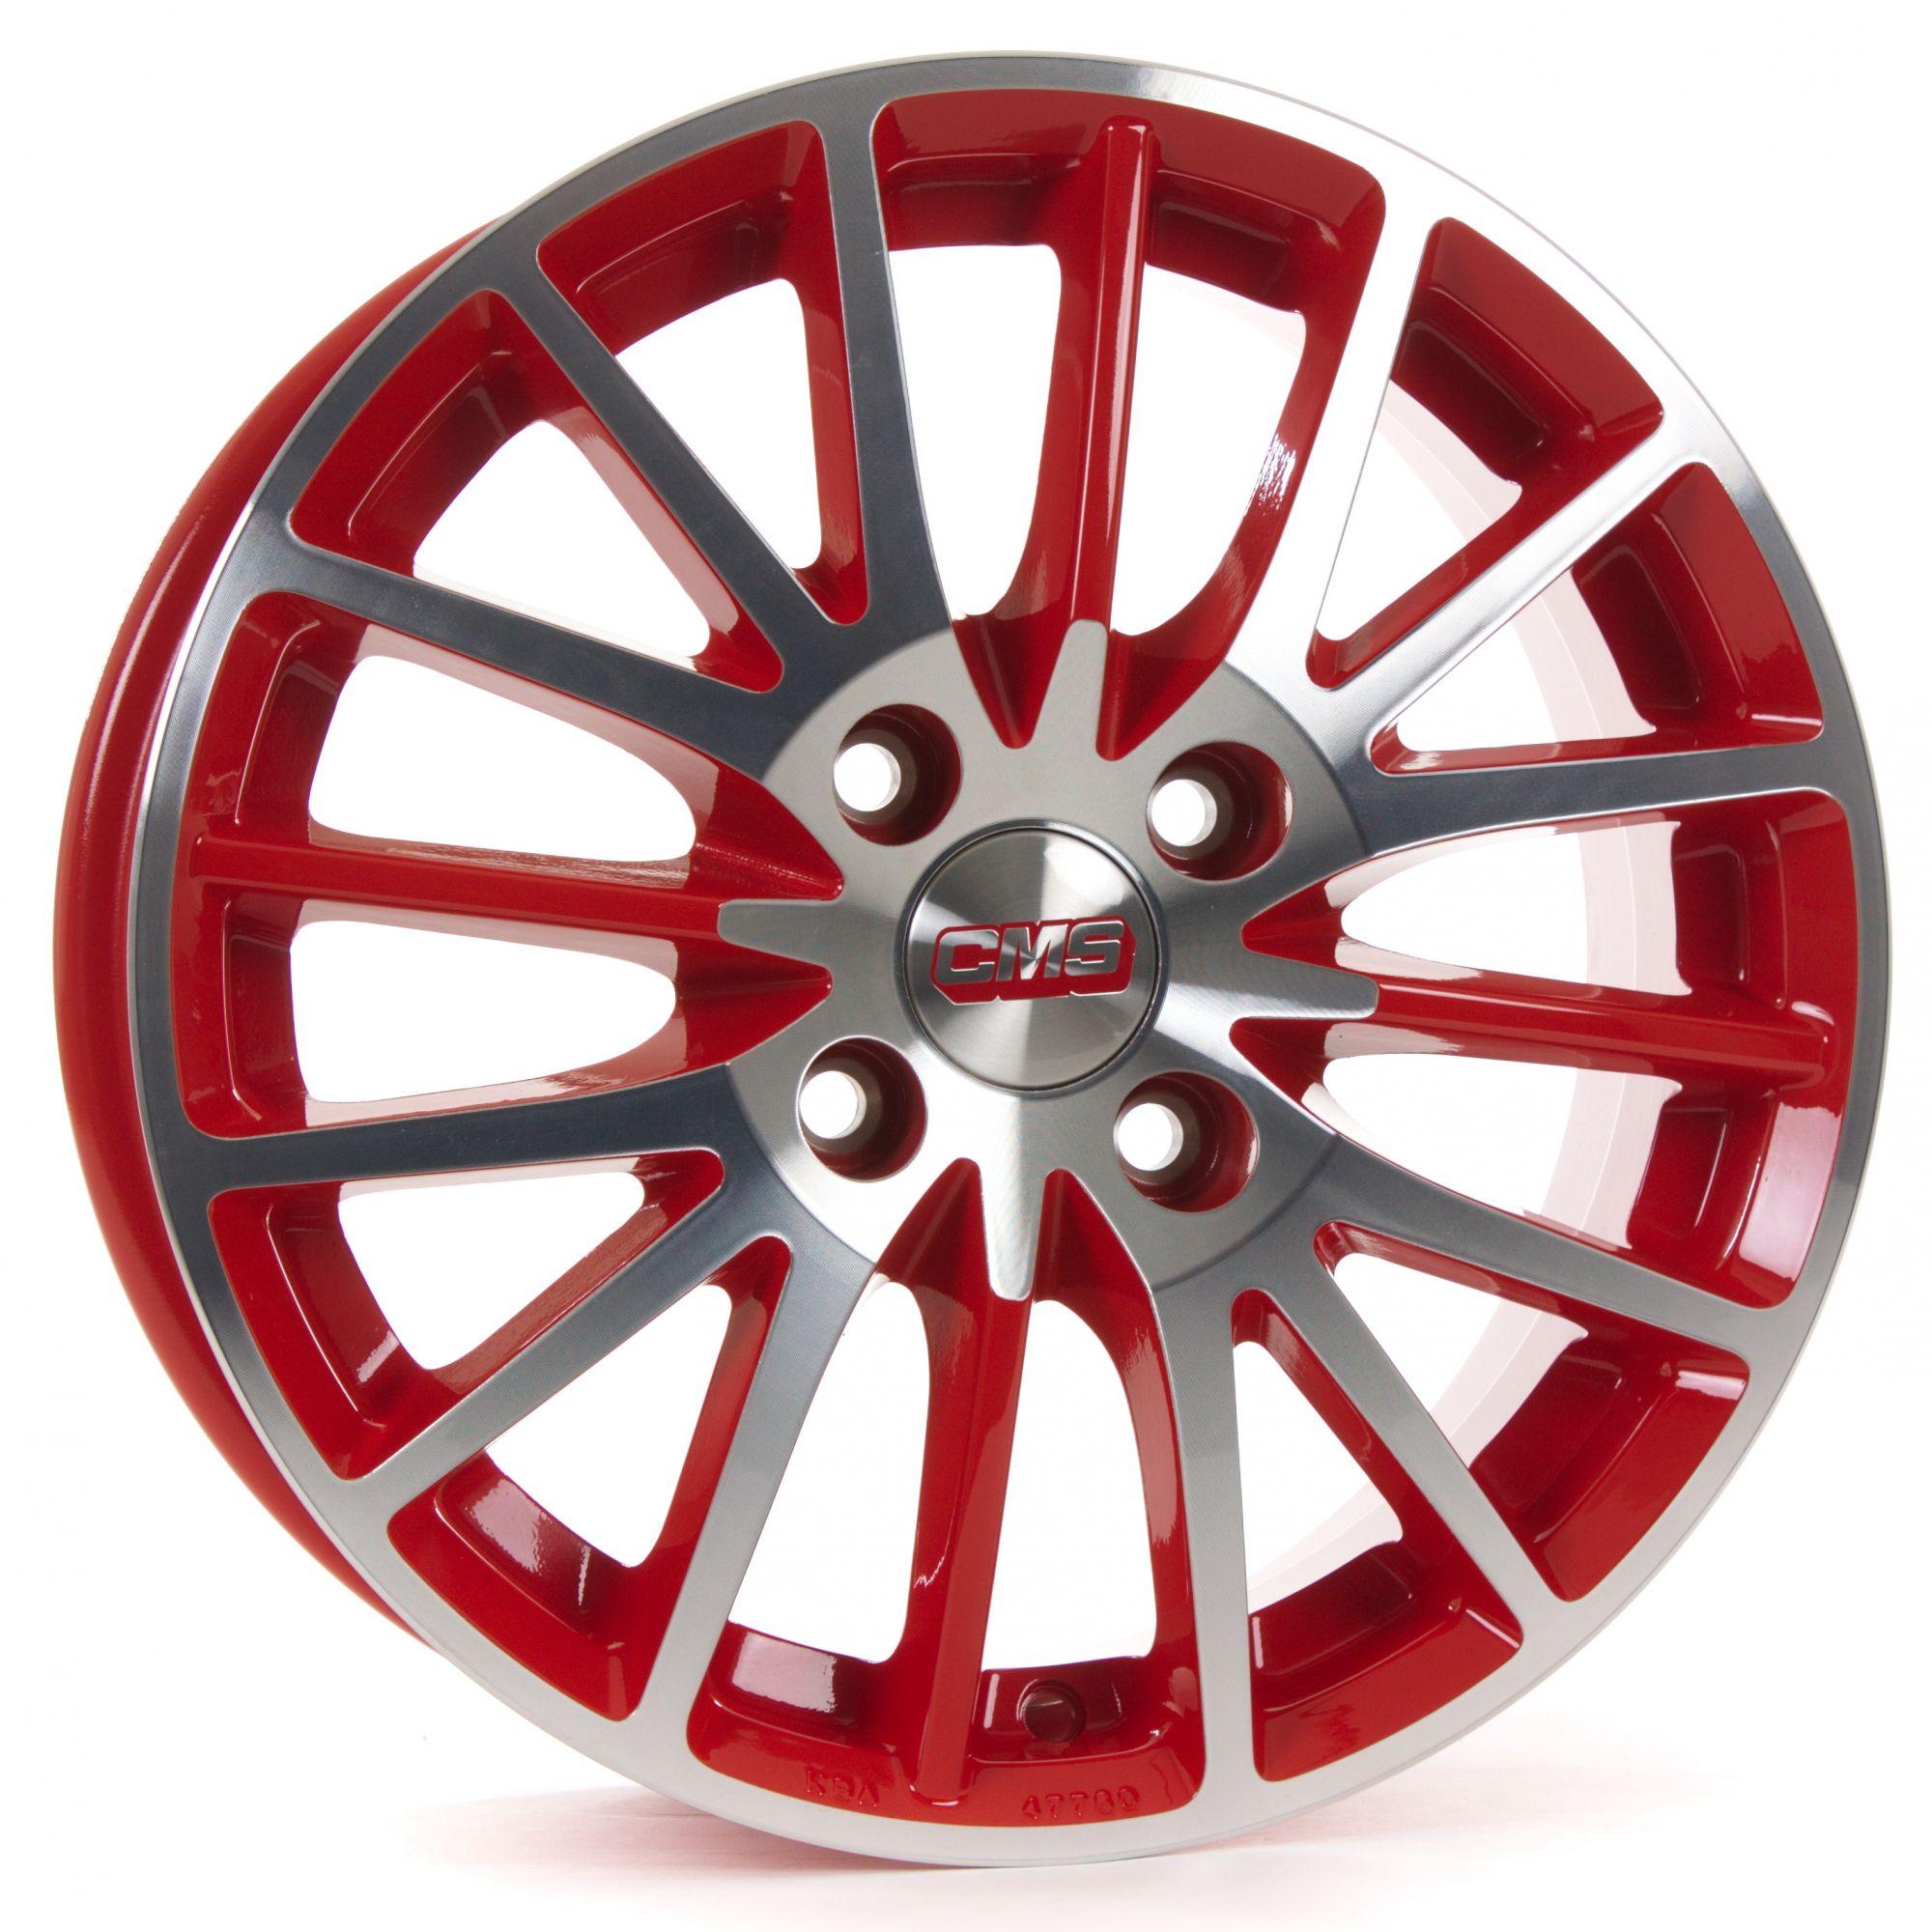 cms c17 felgen diamond red gloss silber rot mehrfarbig. Black Bedroom Furniture Sets. Home Design Ideas